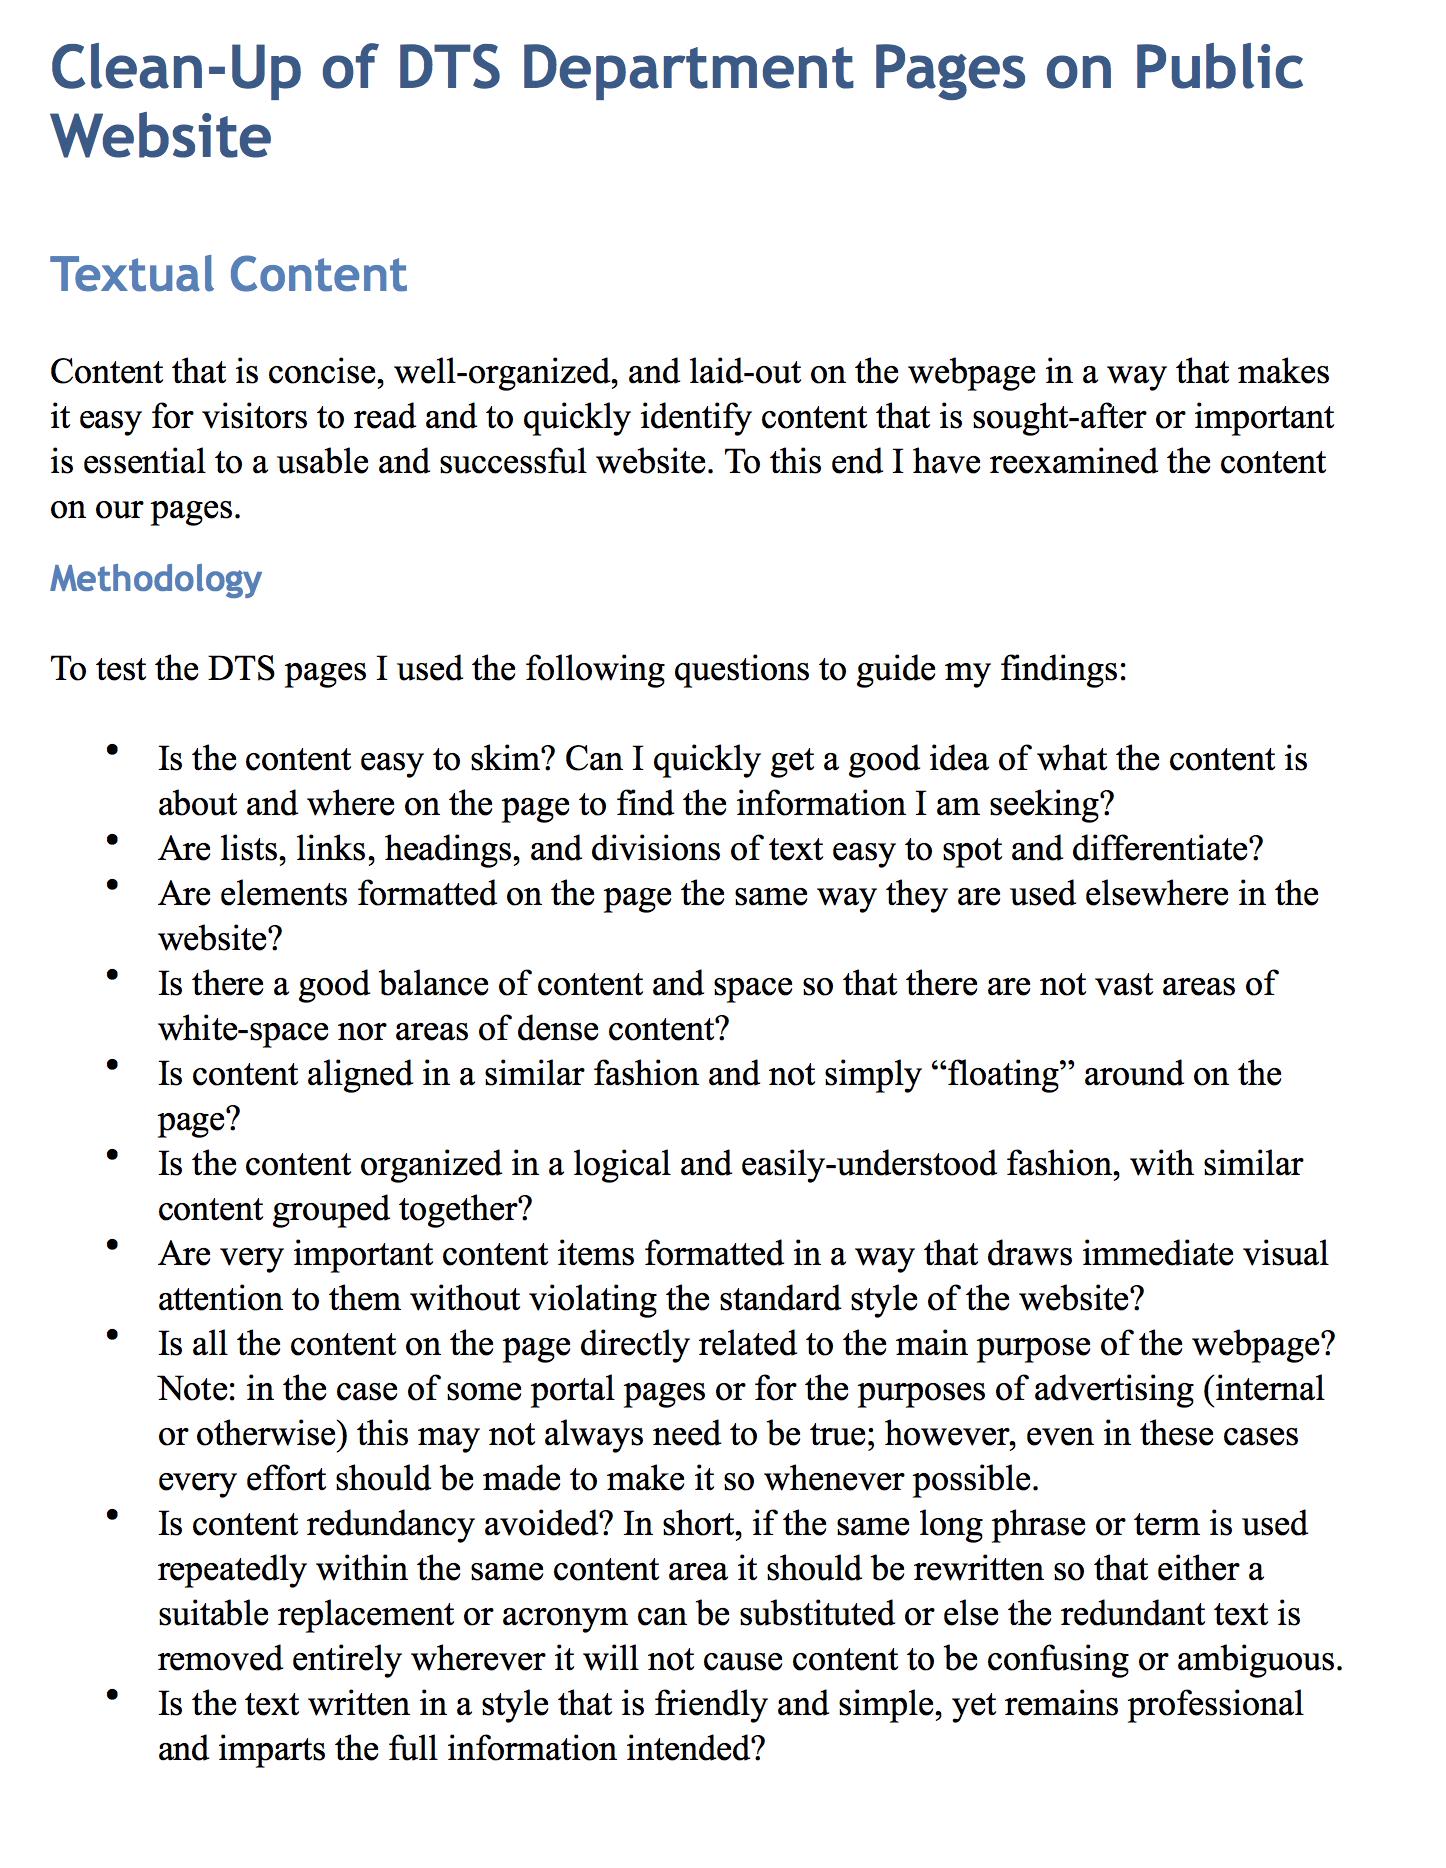 Content clean-up methodologies